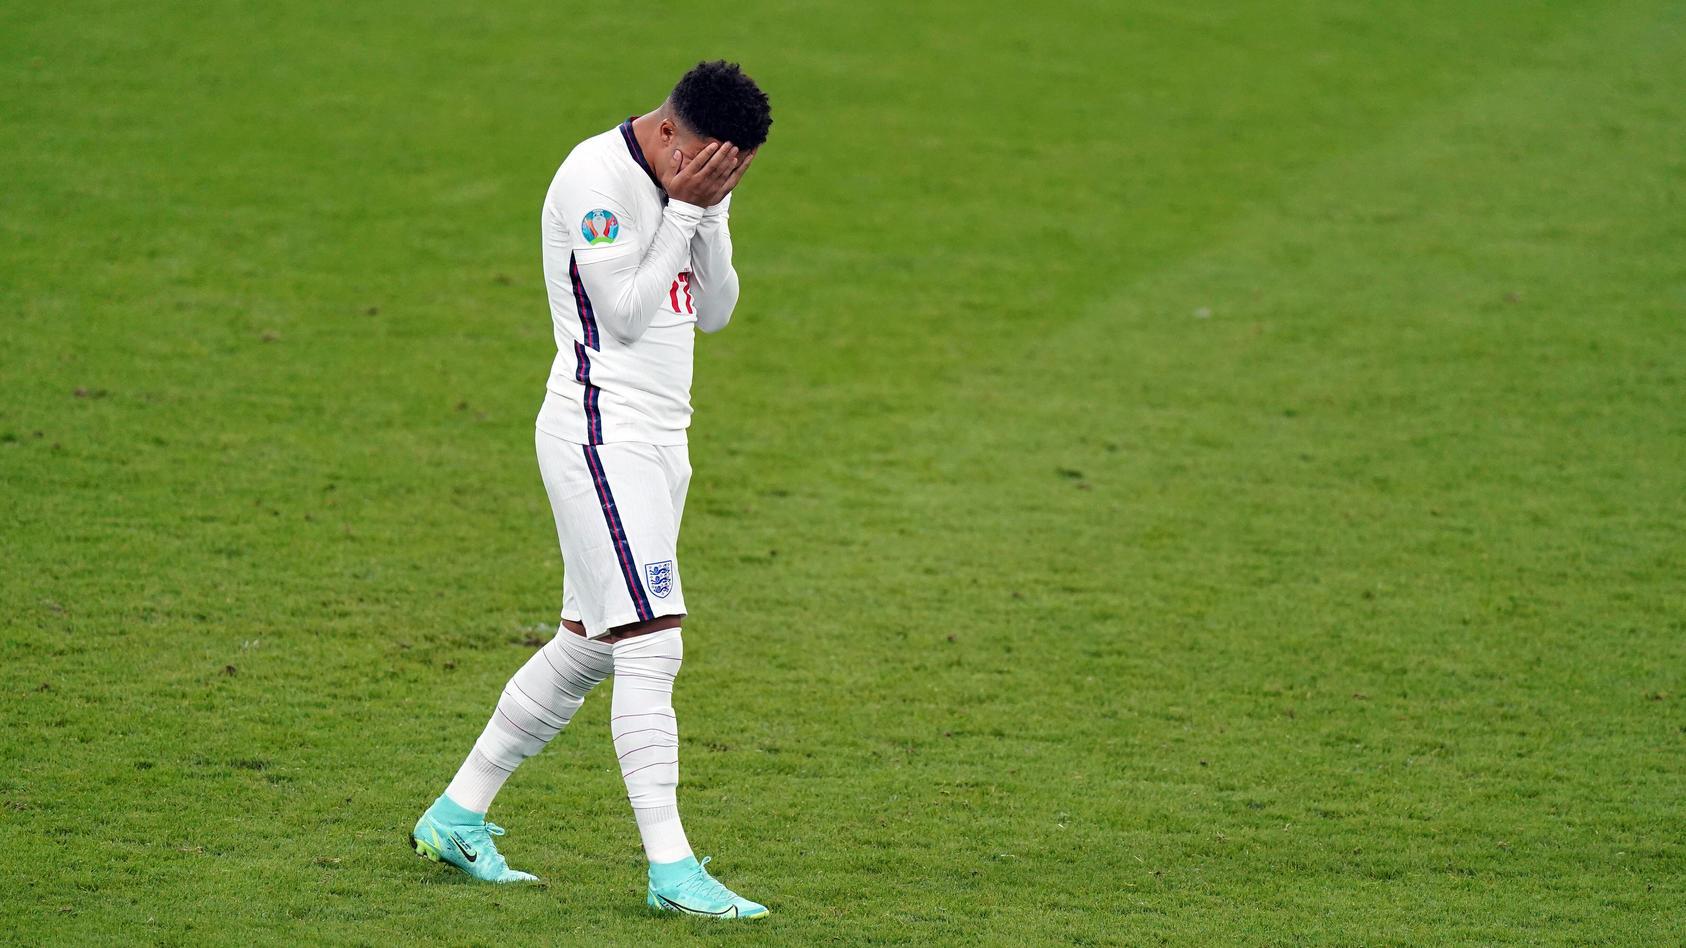 Italy v England - UEFA EURO, EM, Europameisterschaft,Fussball 2020 Final - Wembley Stadium England s Jadon Sancho stand